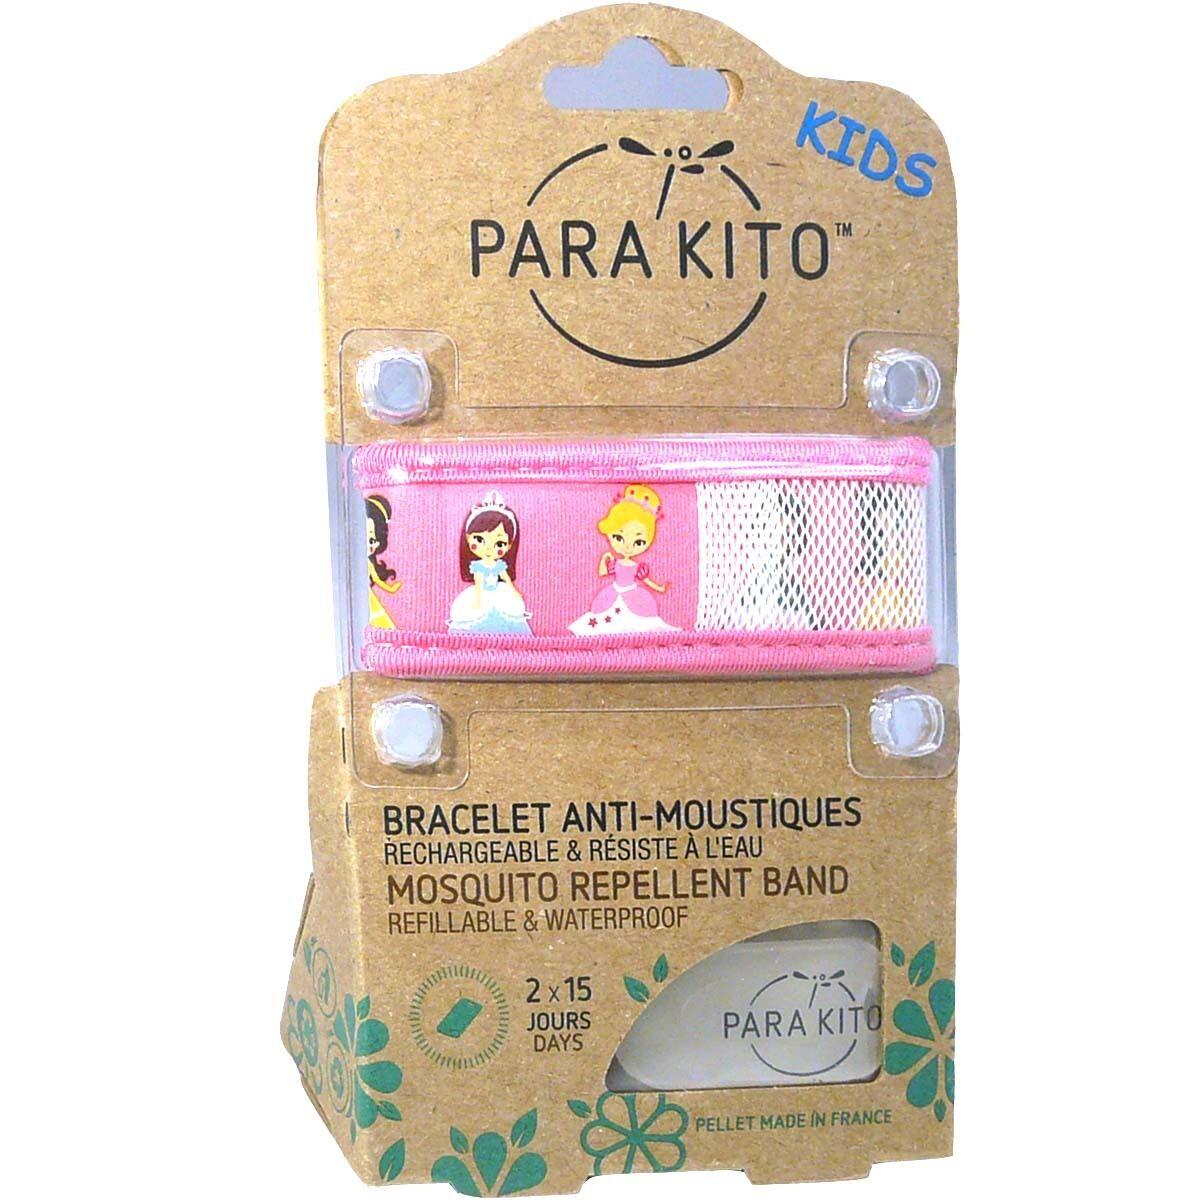 PARA KITO Para'kito kids bracelet anti-moustiques couleur au choix